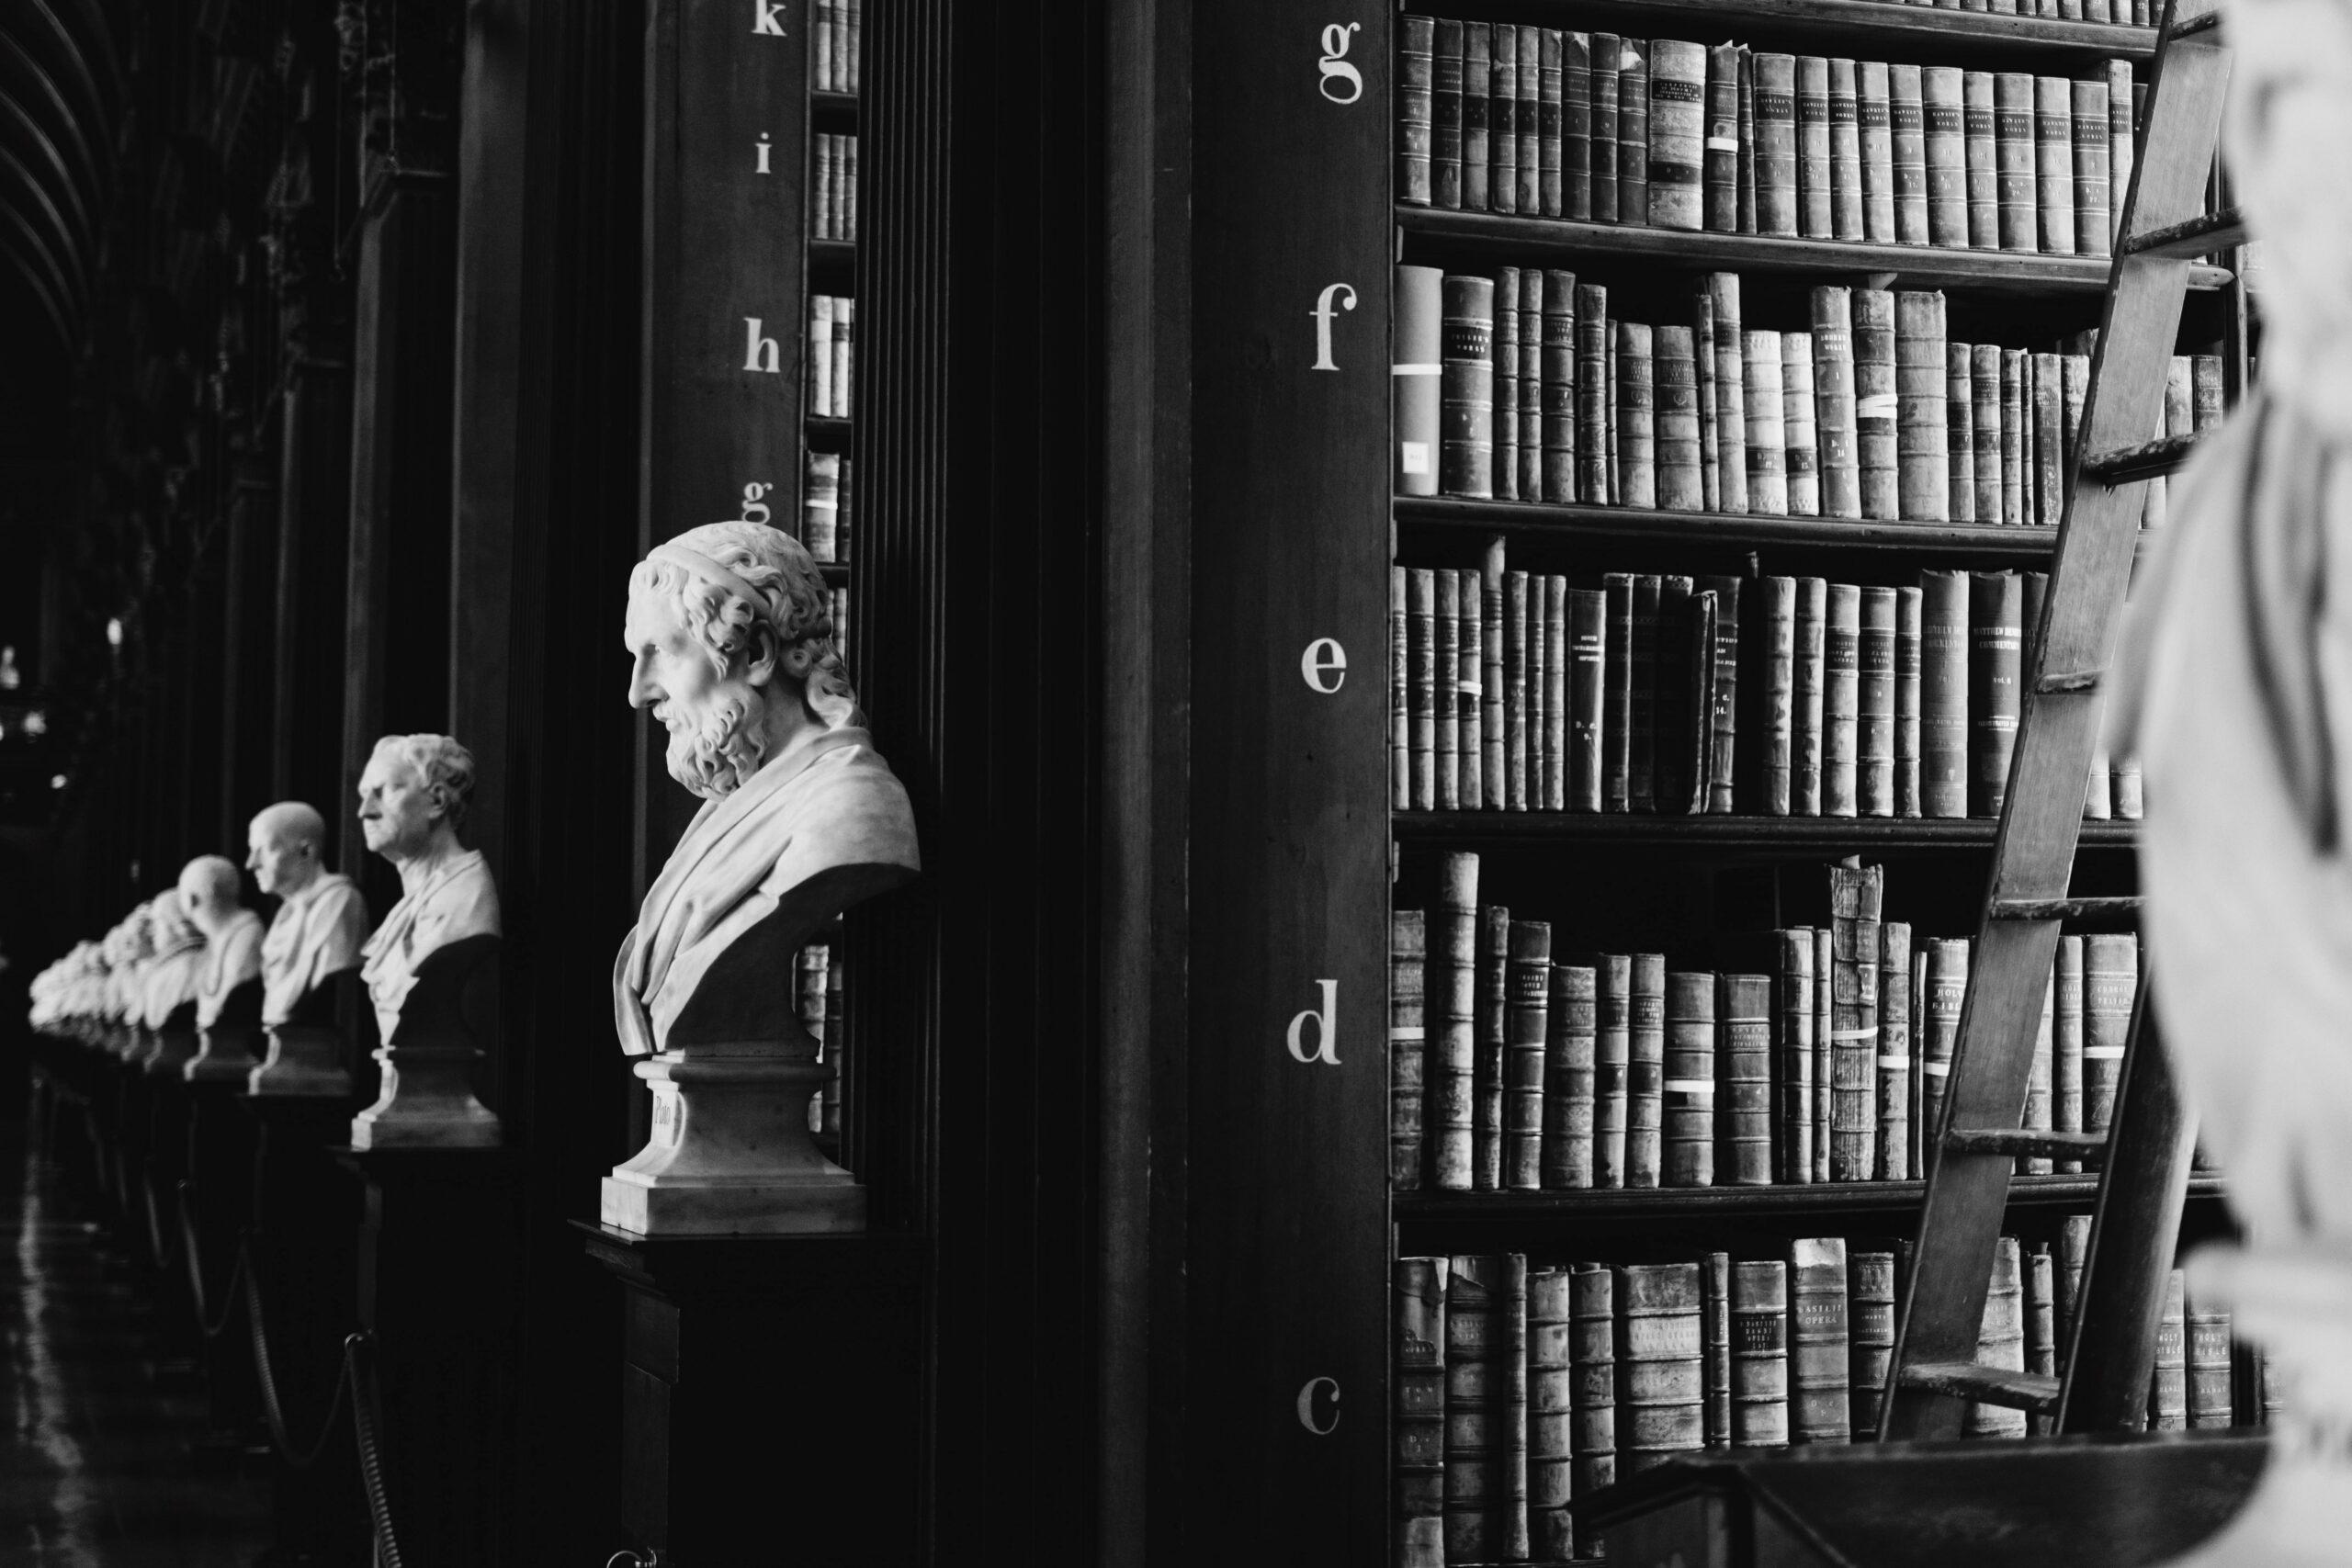 Library B&W